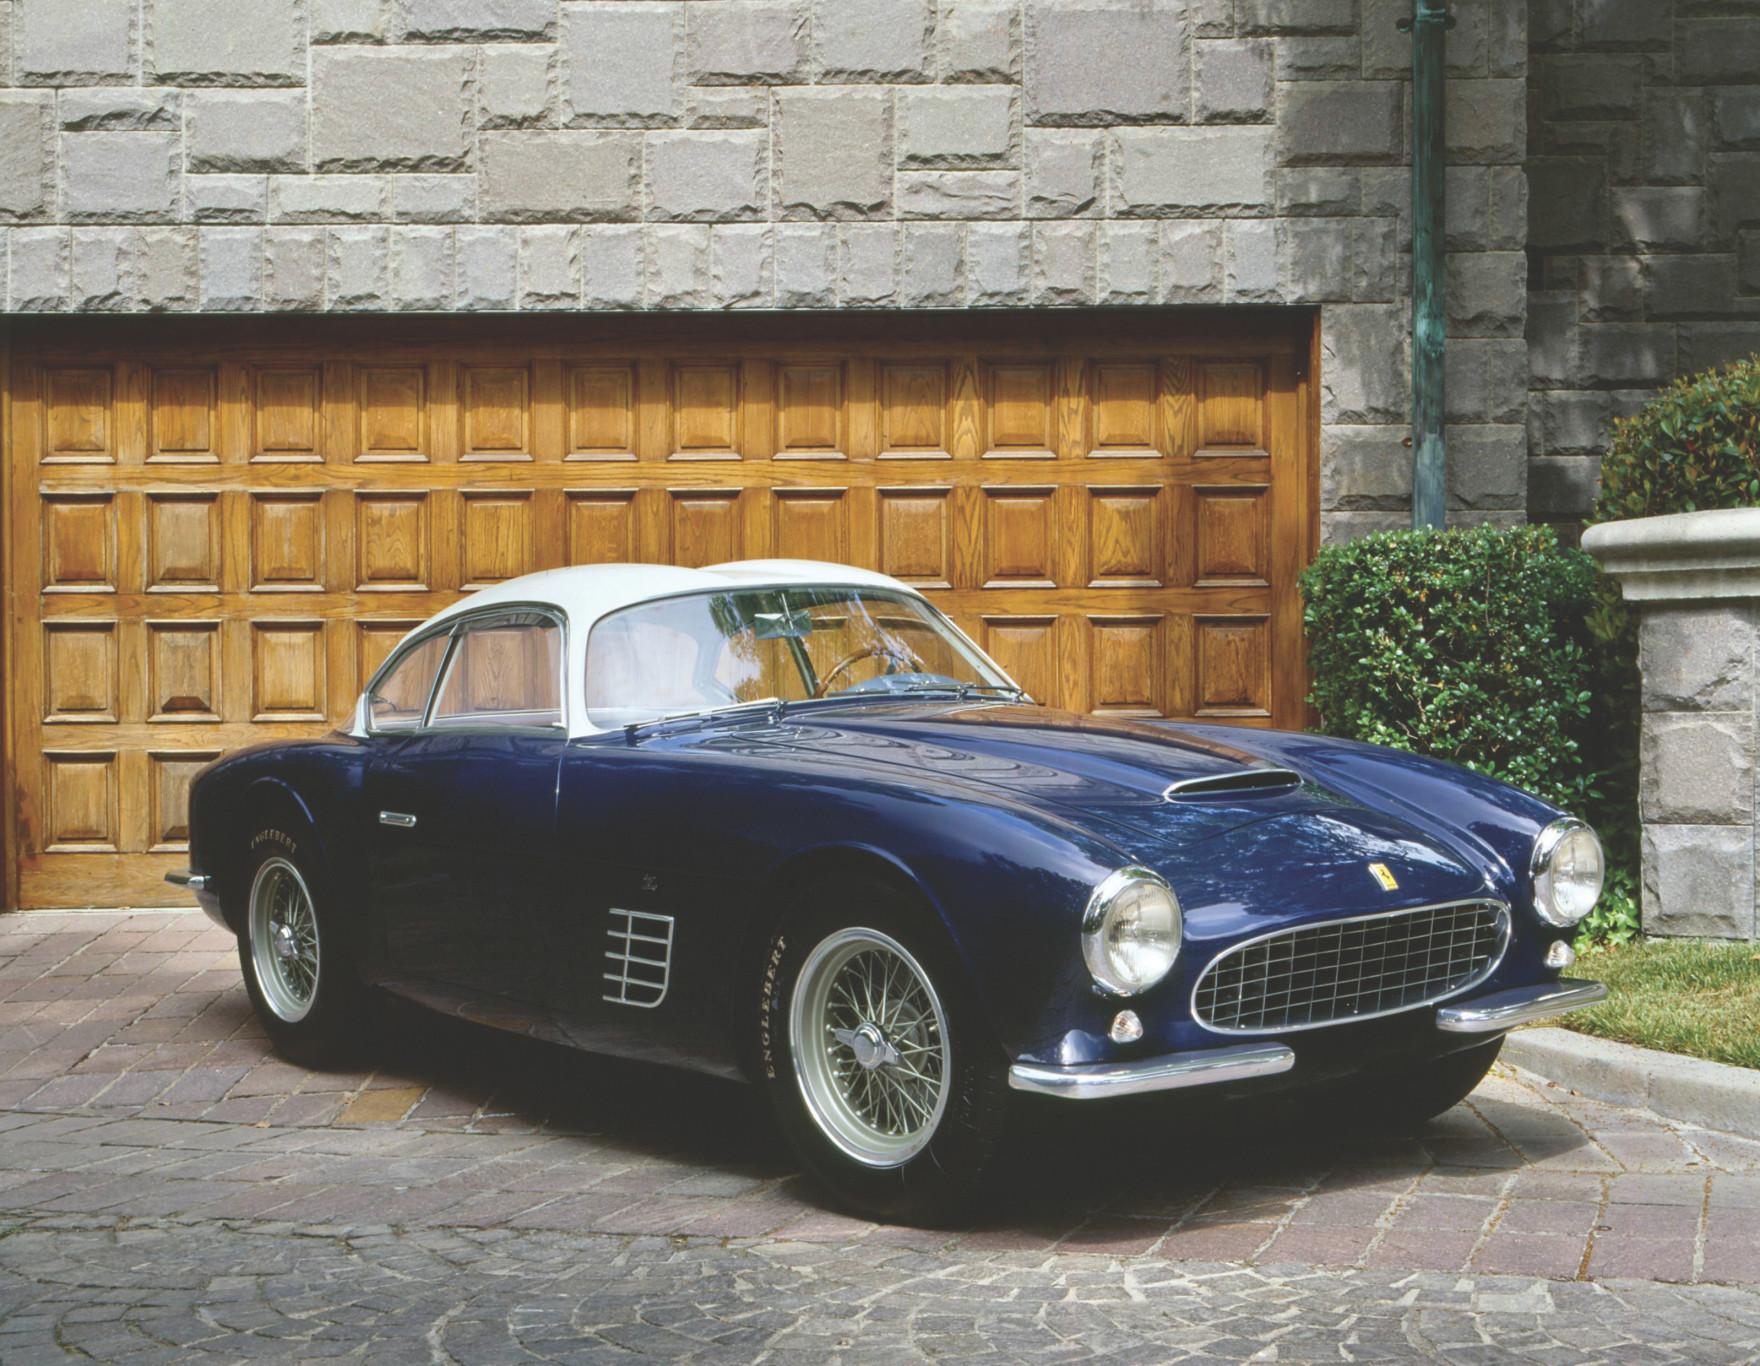 1956 Ferrari 250 GT Berlina (Zagato) - Studios